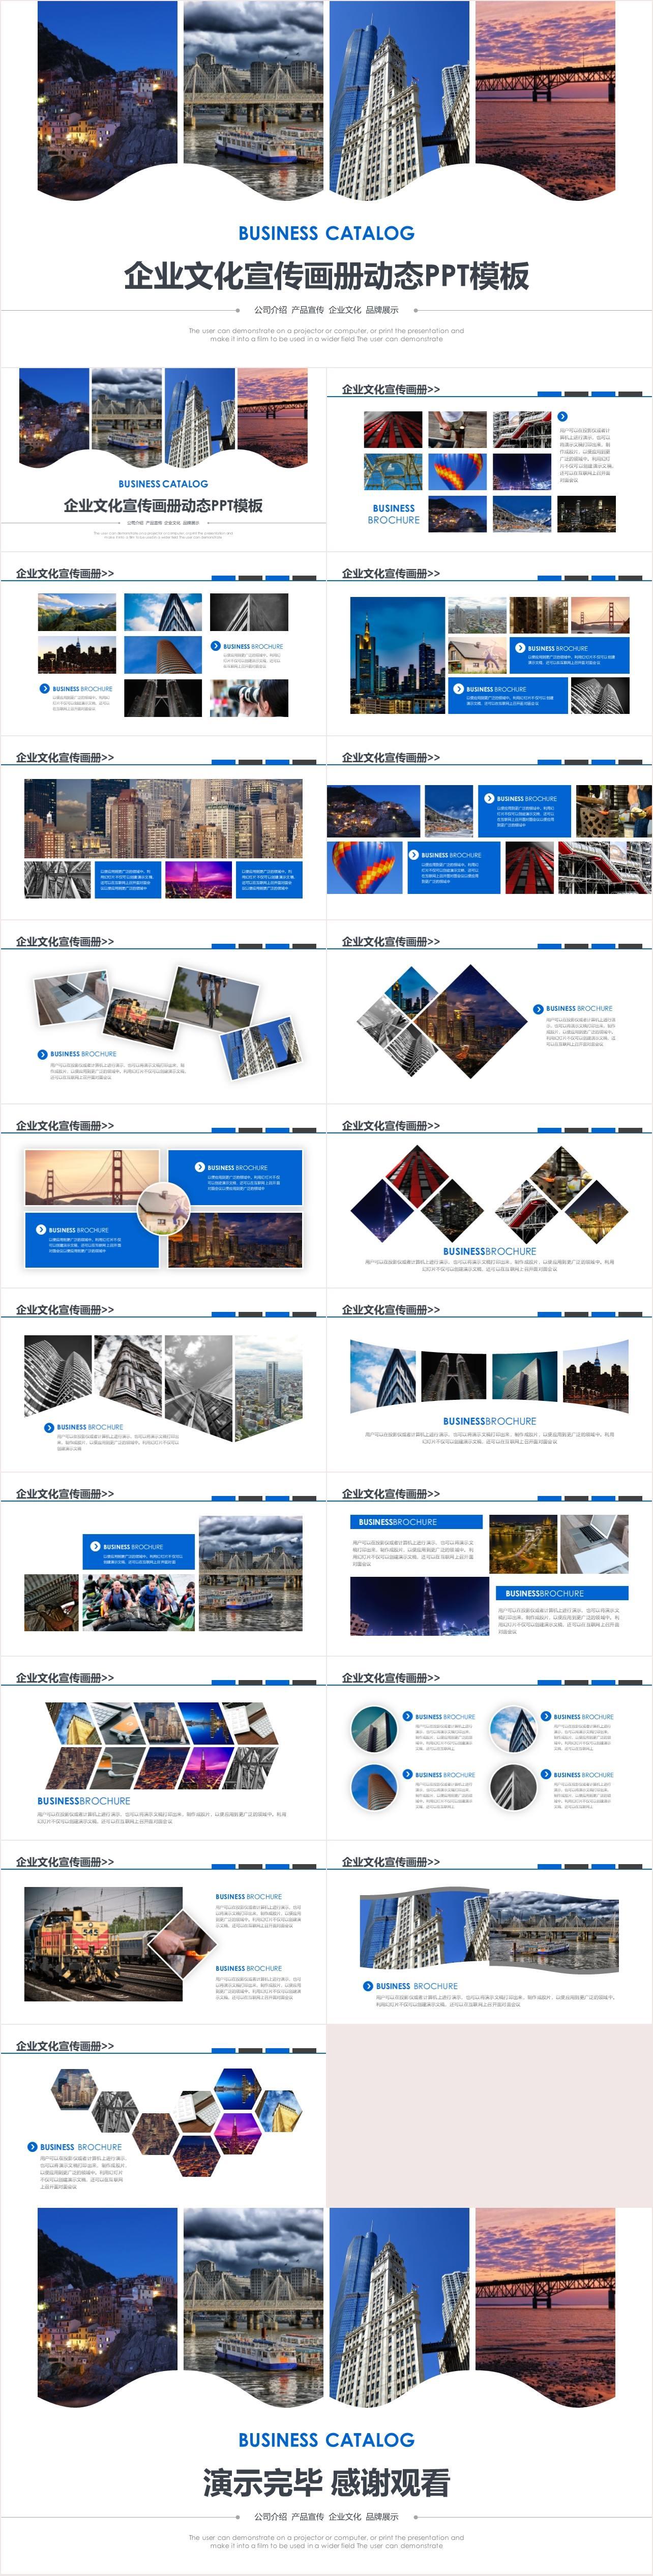 CL0112 时尚企业简介公司宣传画册PPT模板